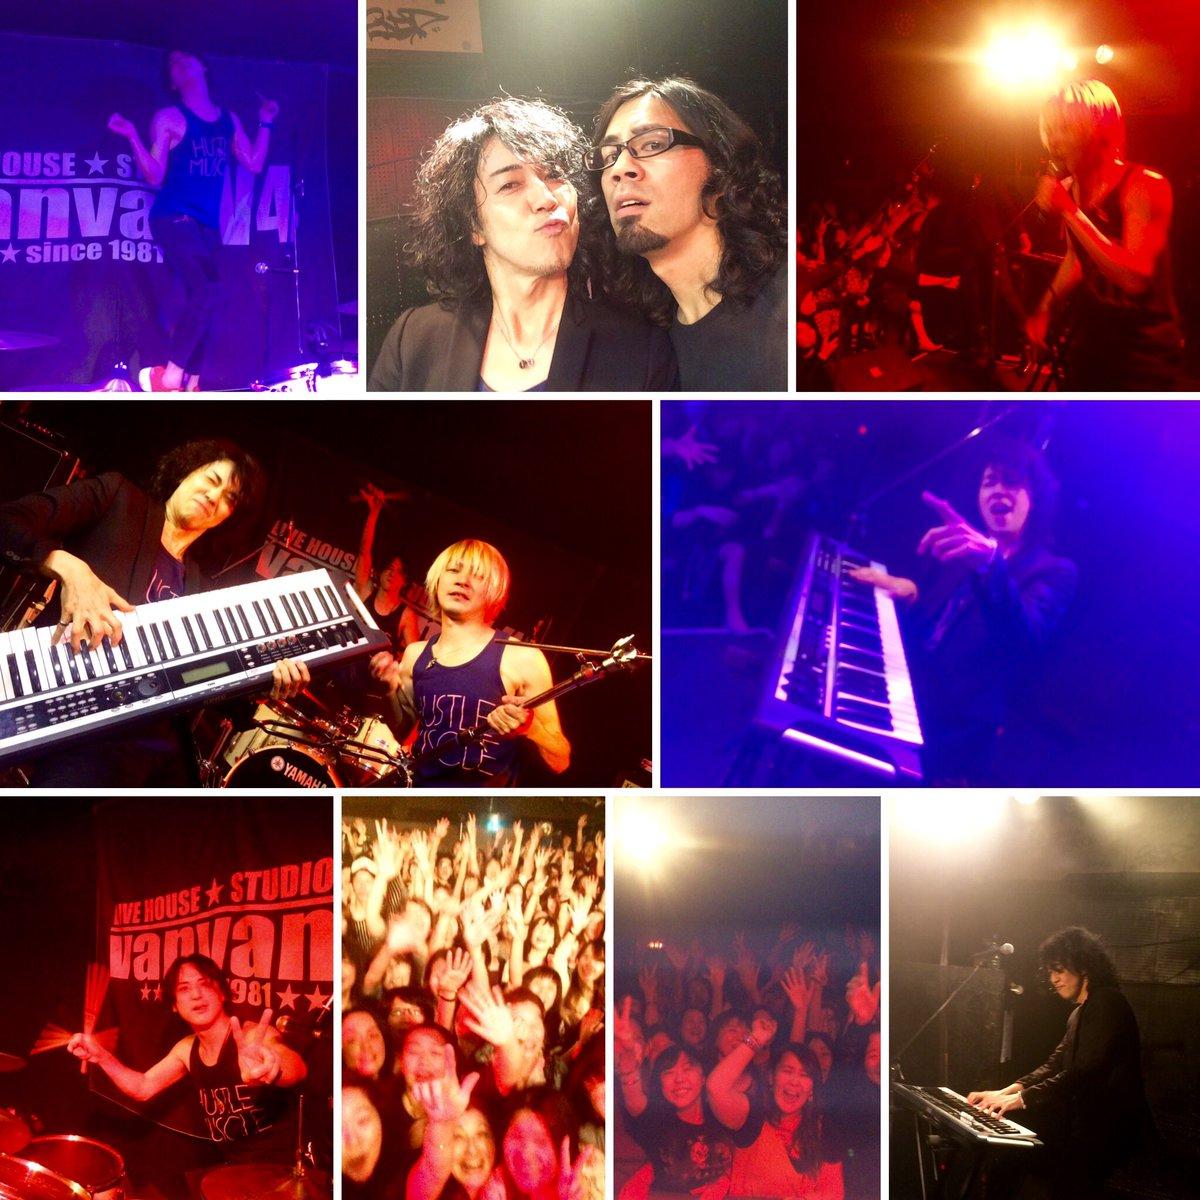 brainchild's@金沢vanvan V4 TOUR FINAL!!THANK YOU!! #brainchilds https://t.co/7hXnDS61cm